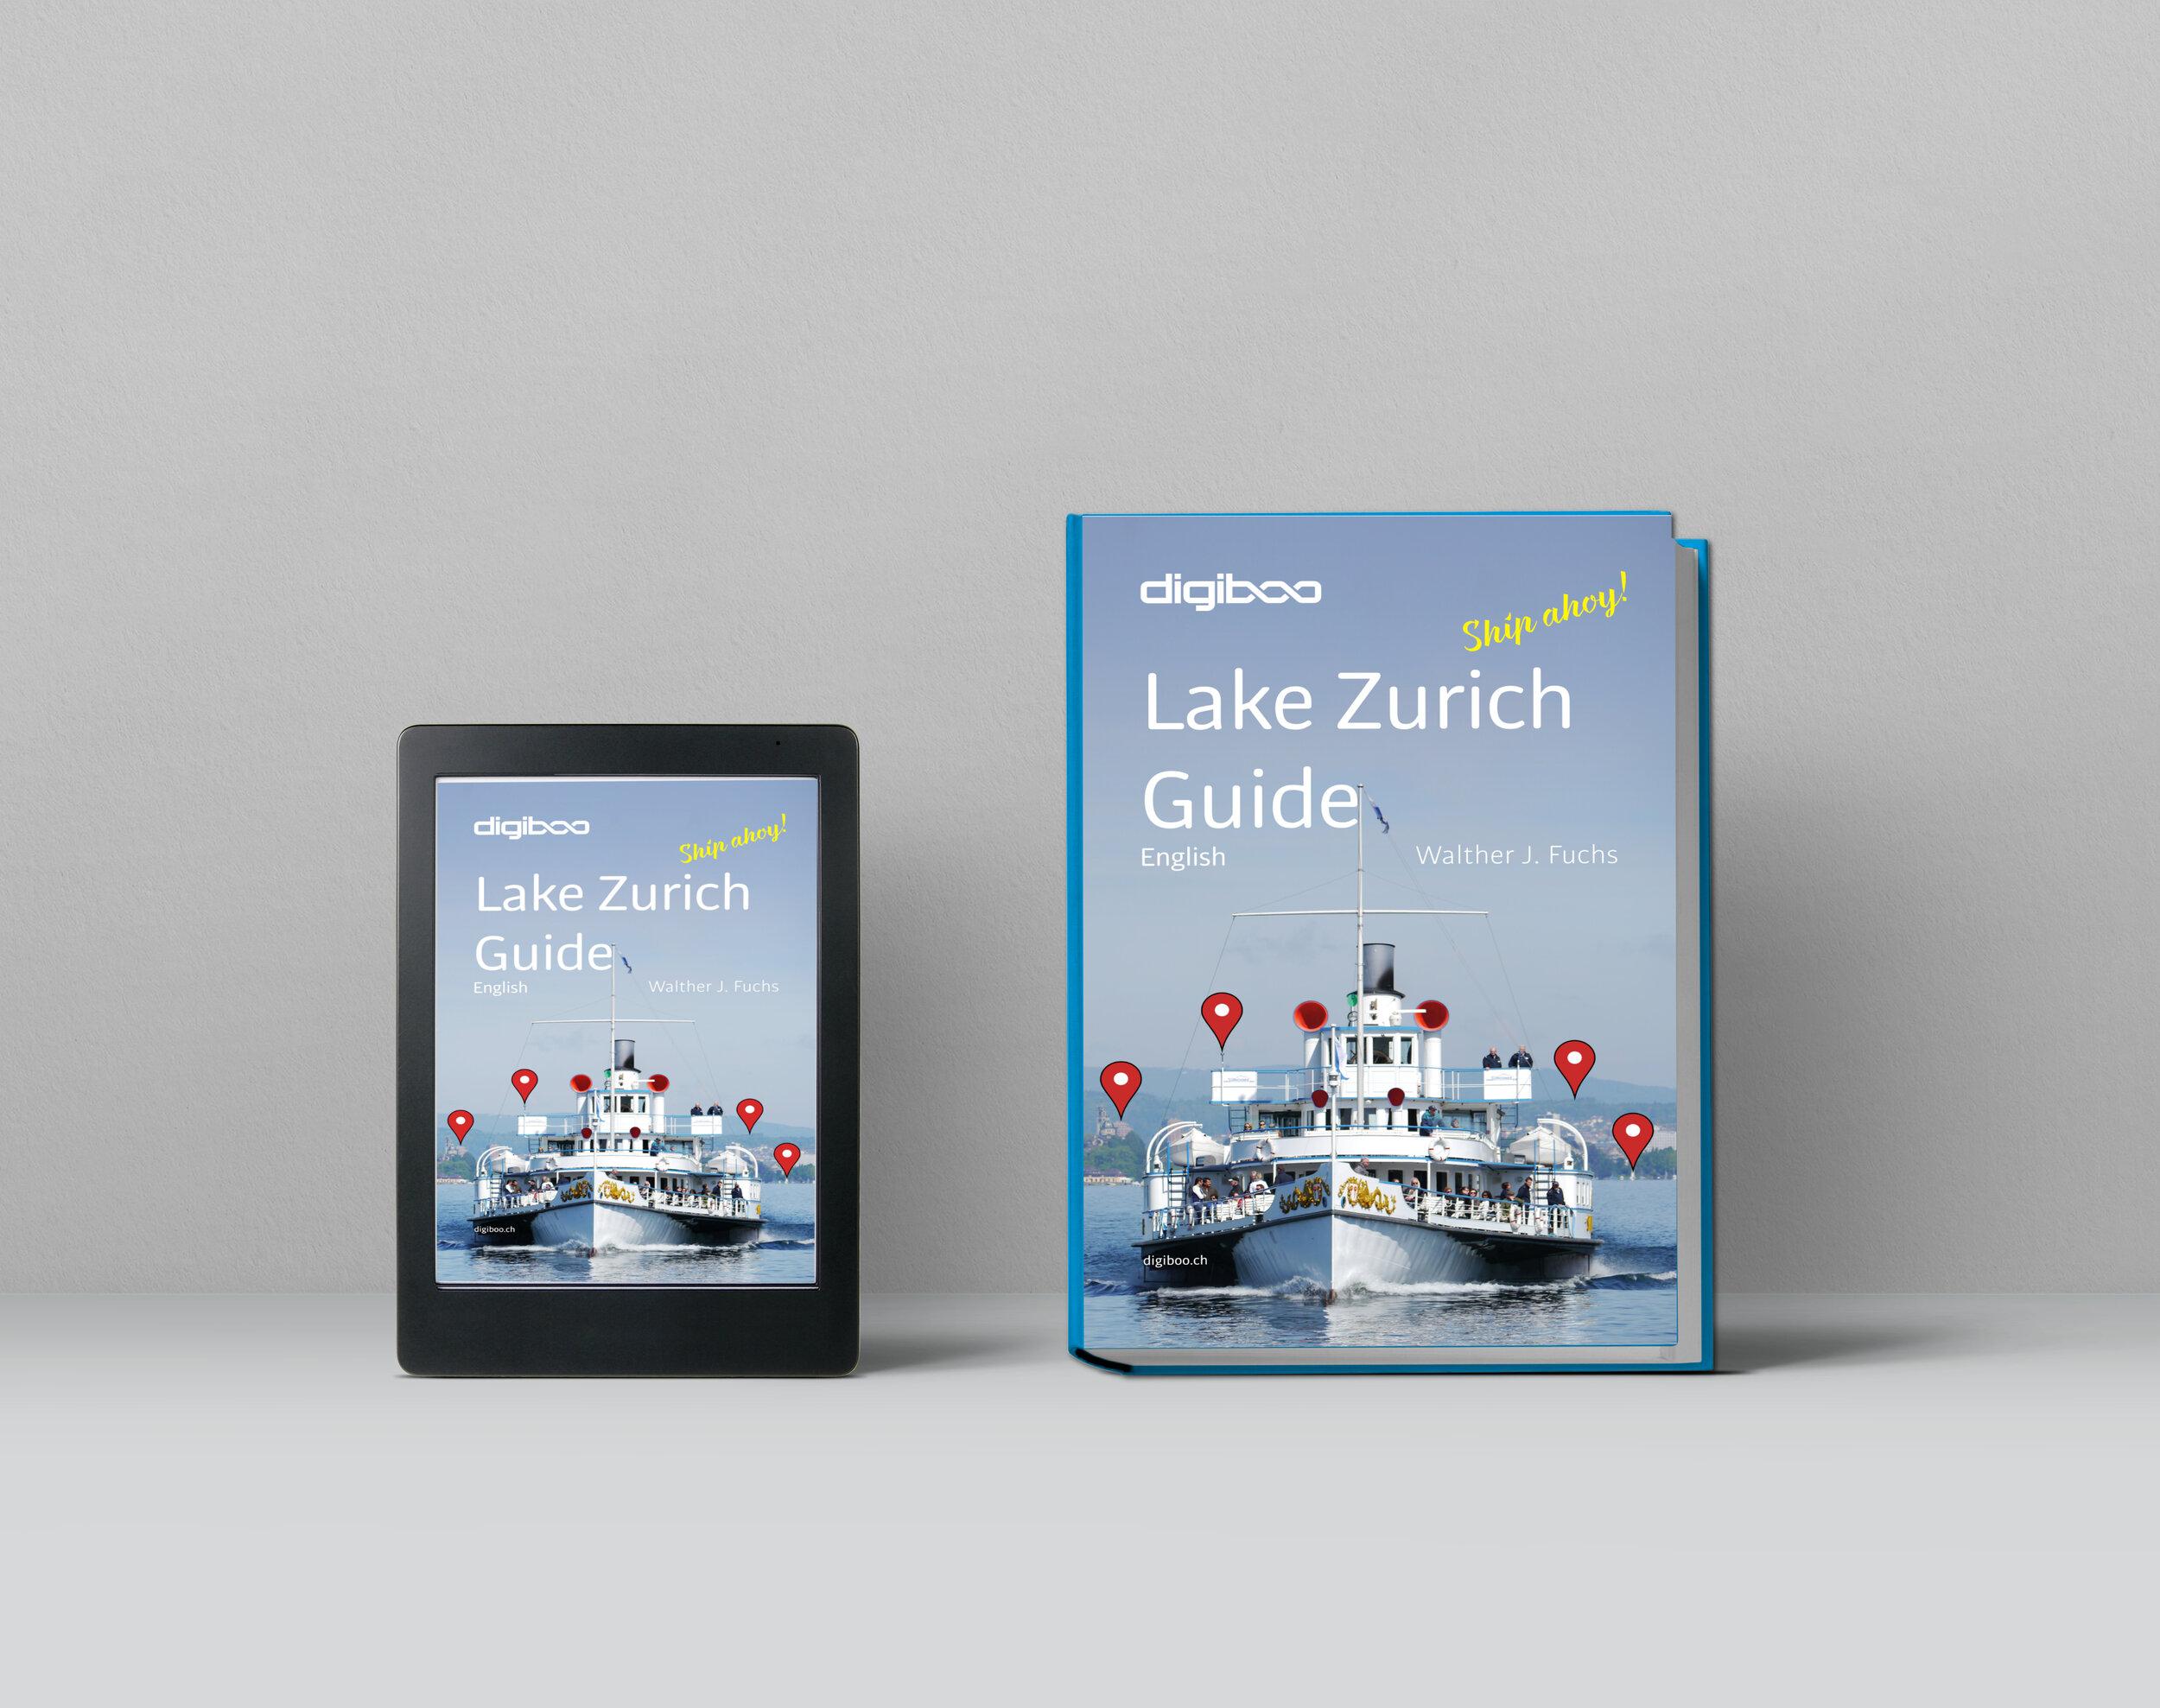 Lake Zurich Guide   : Ship  ahoy! Print and E-Book